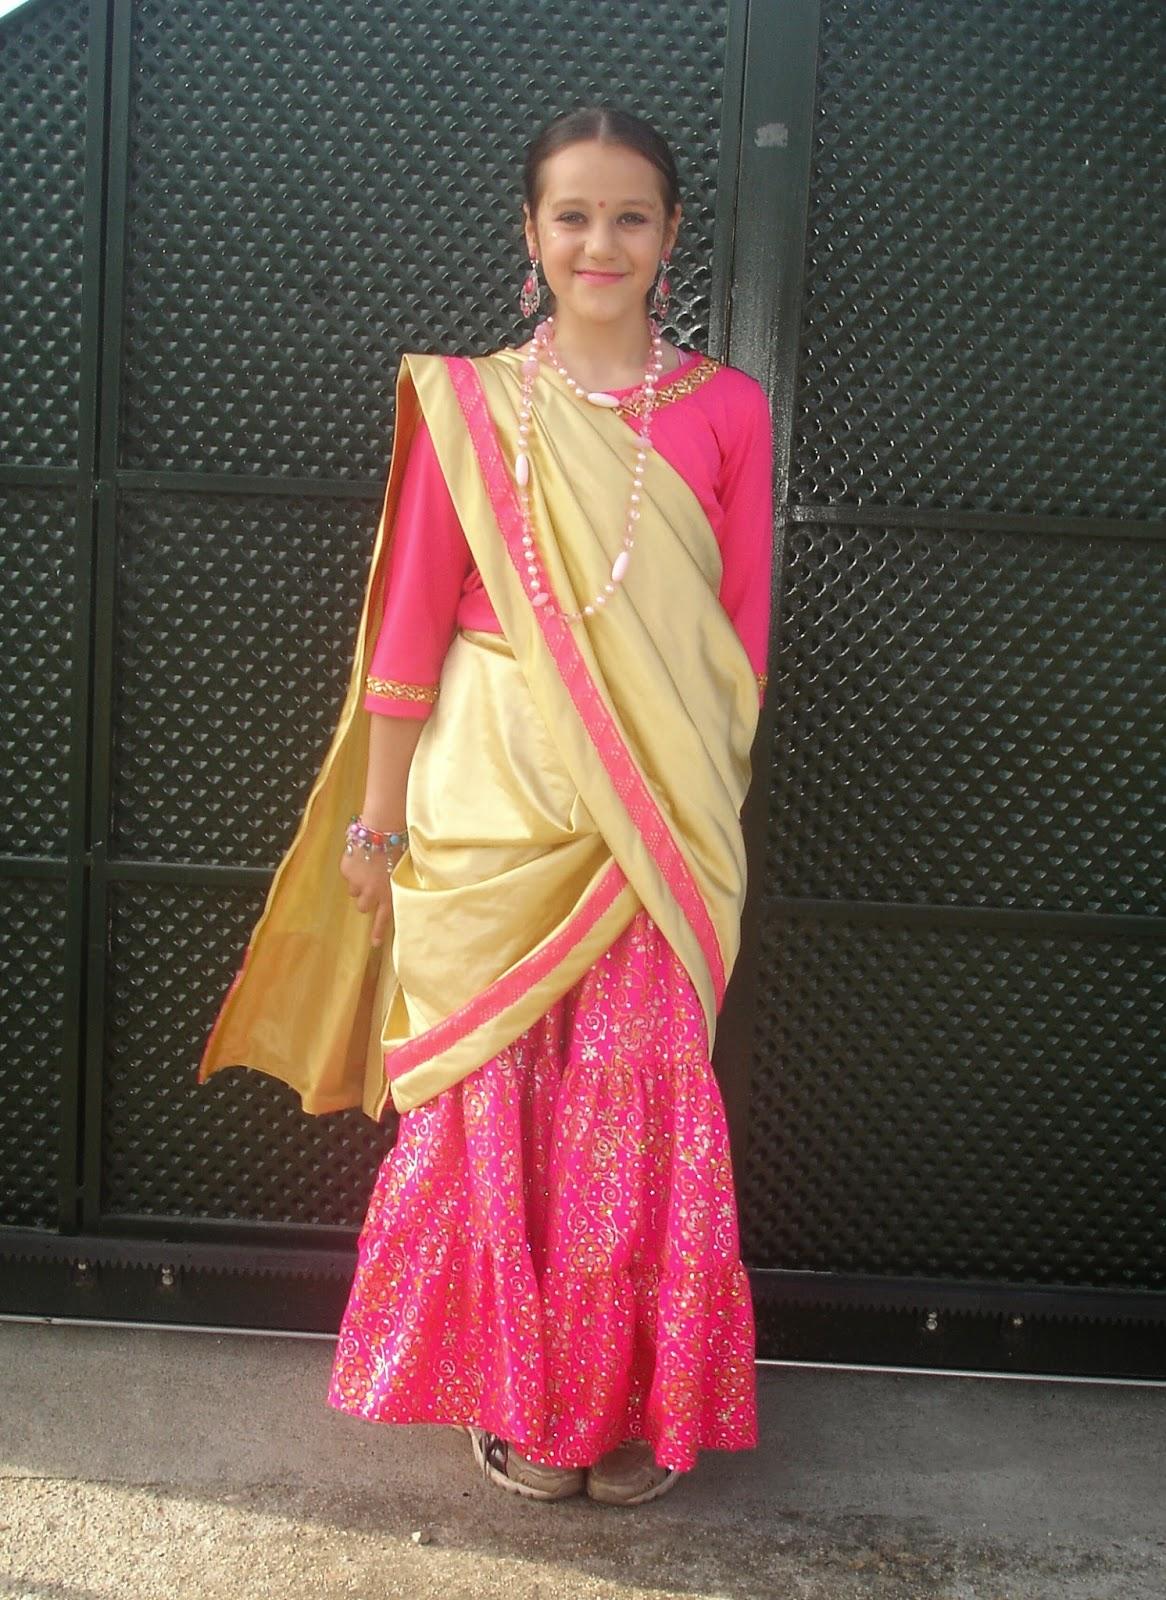 Vestido hindu mujer